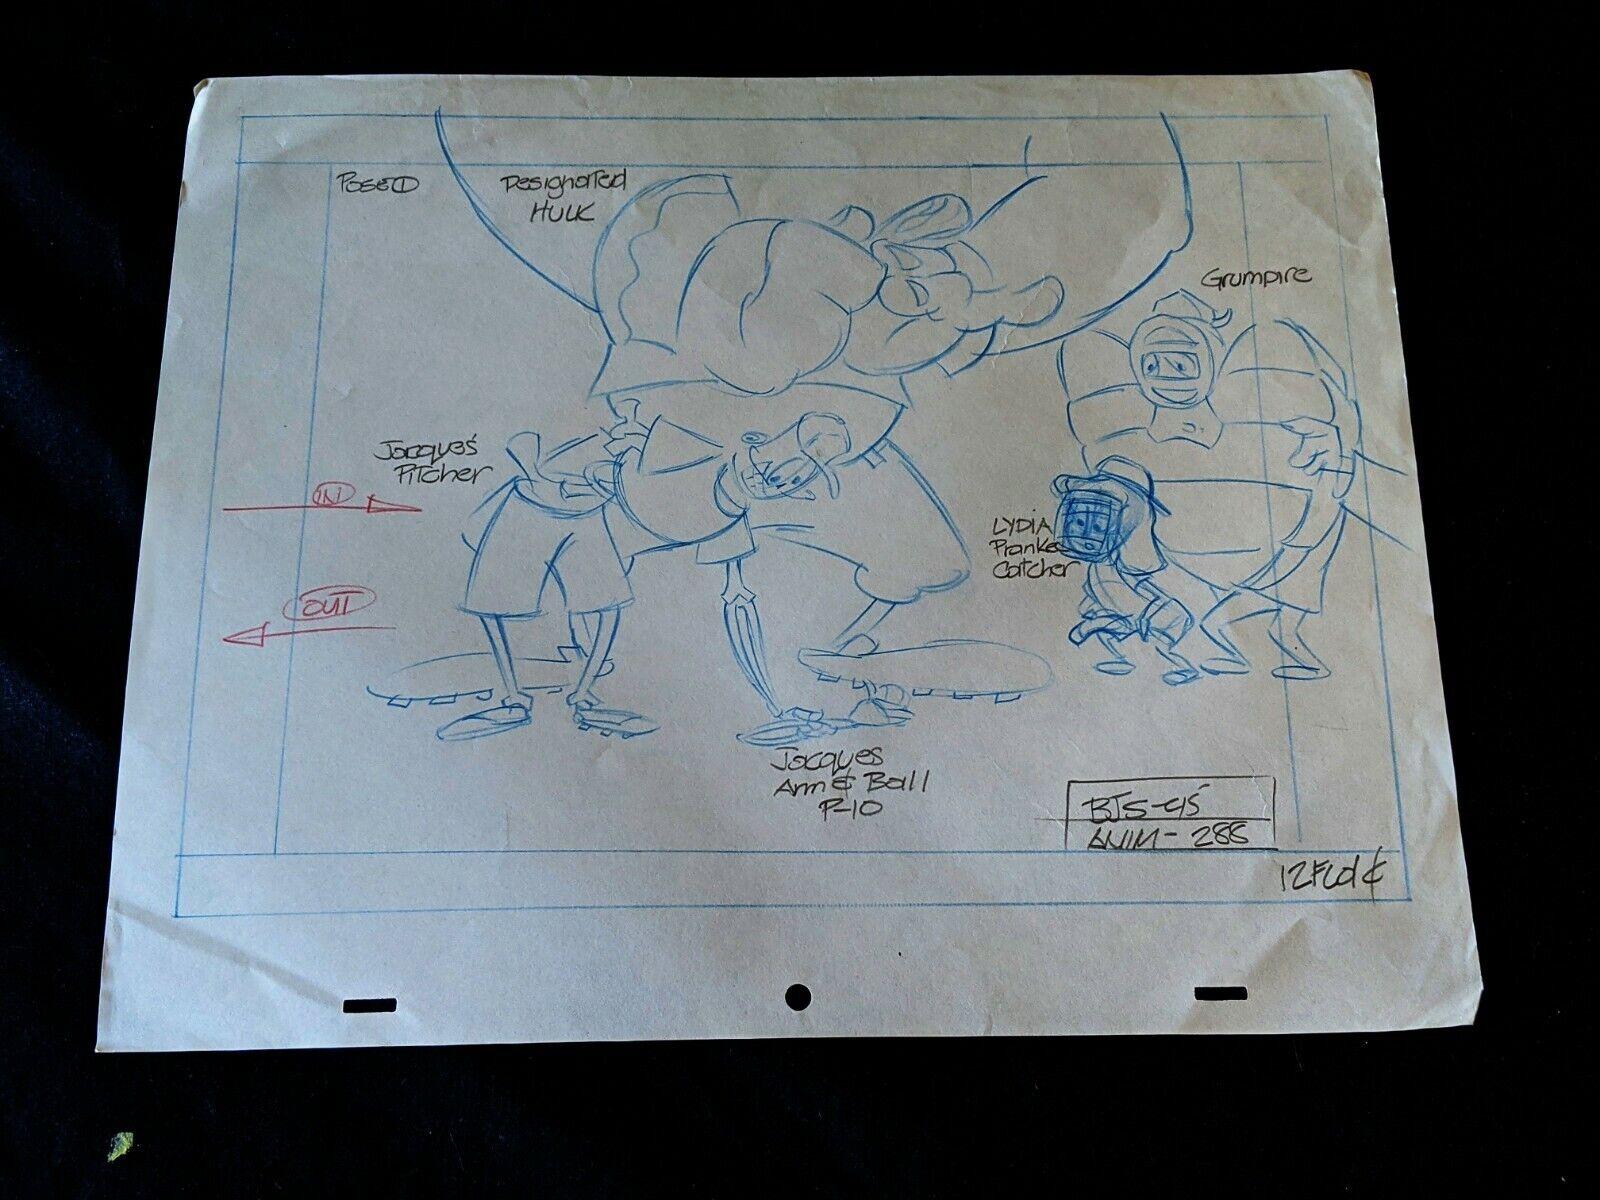 Beetlejuice 1989 TV Series Animation Production LYDIA Hand Drawn Pencil Art - $9.99